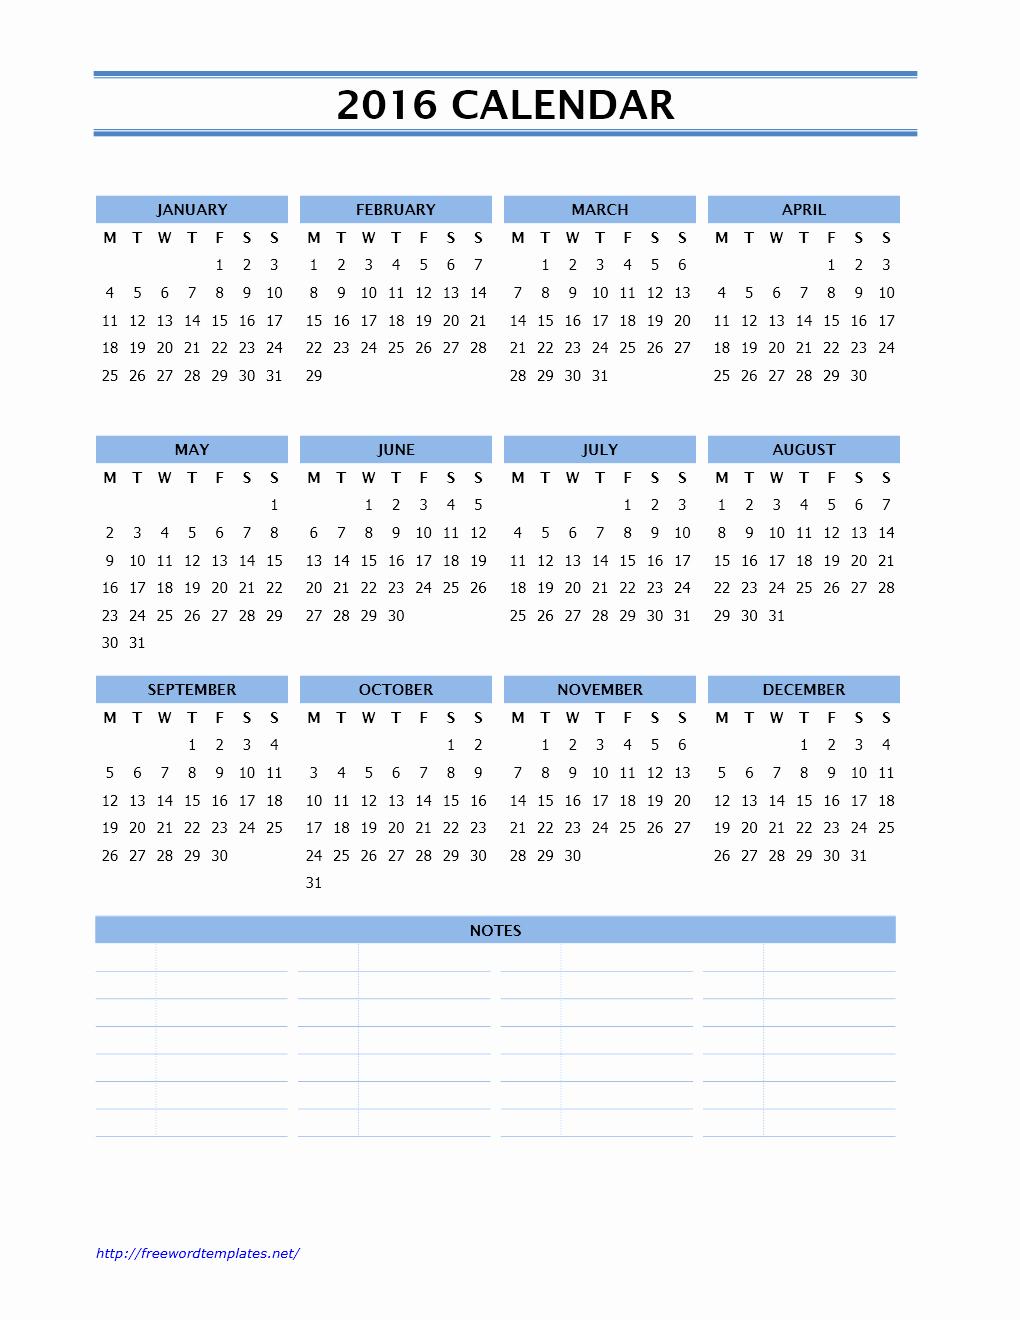 2016 Calendar Templates